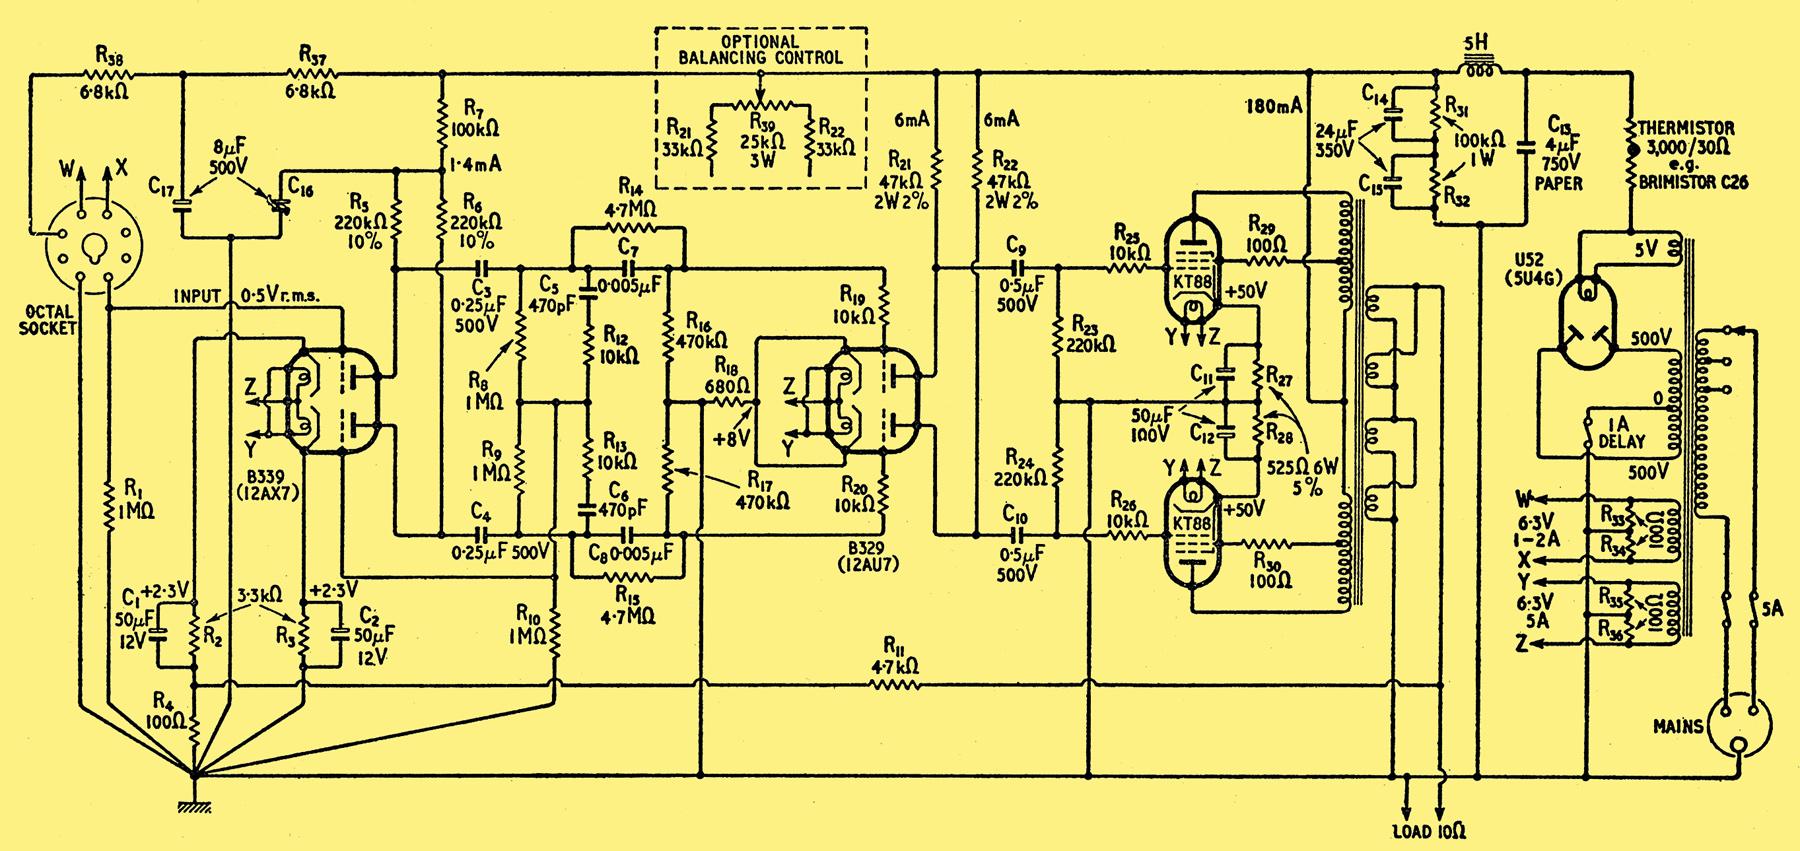 hight resolution of 5000 watts amplifier schematic diagrams data schematic diagram 5000 watts amplifier schematic diagram 5000 watts amplifier schematic diagrams